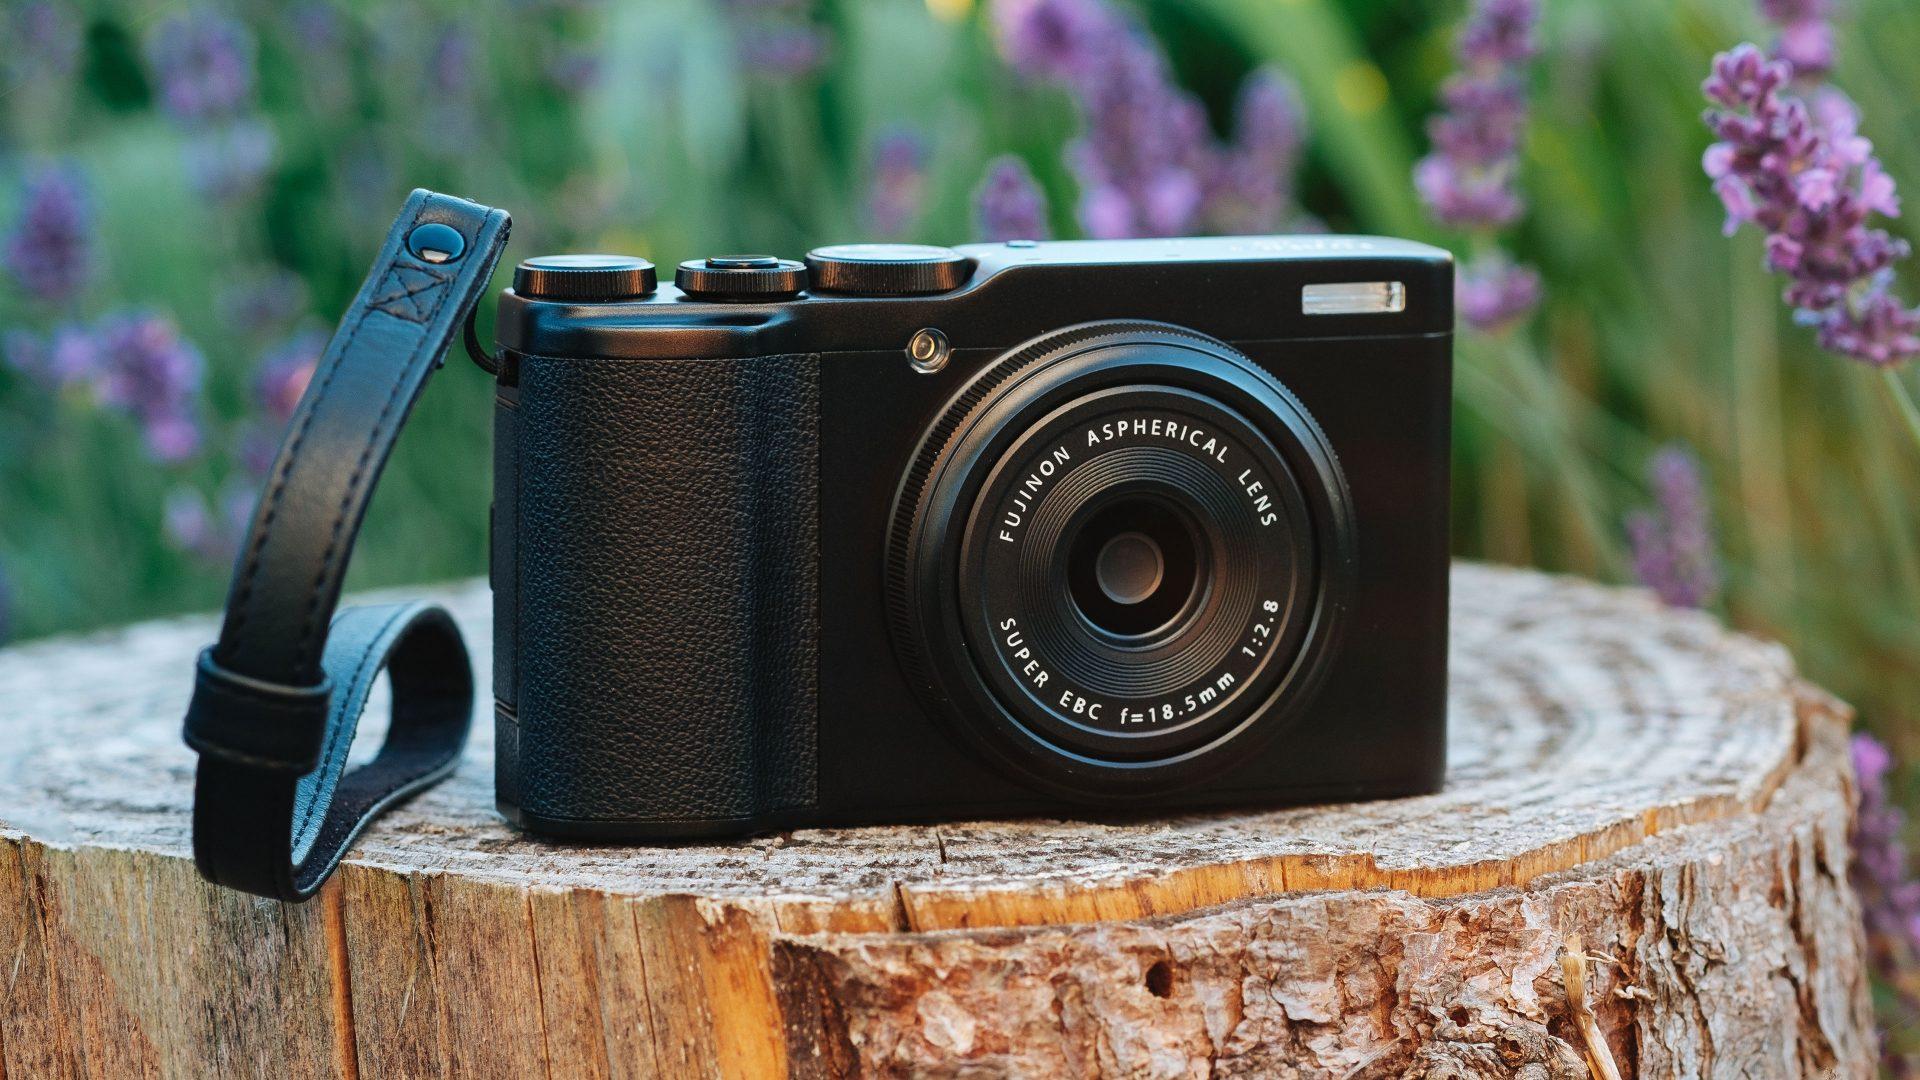 самокат флагманская фотокамера премиум класса прогноз